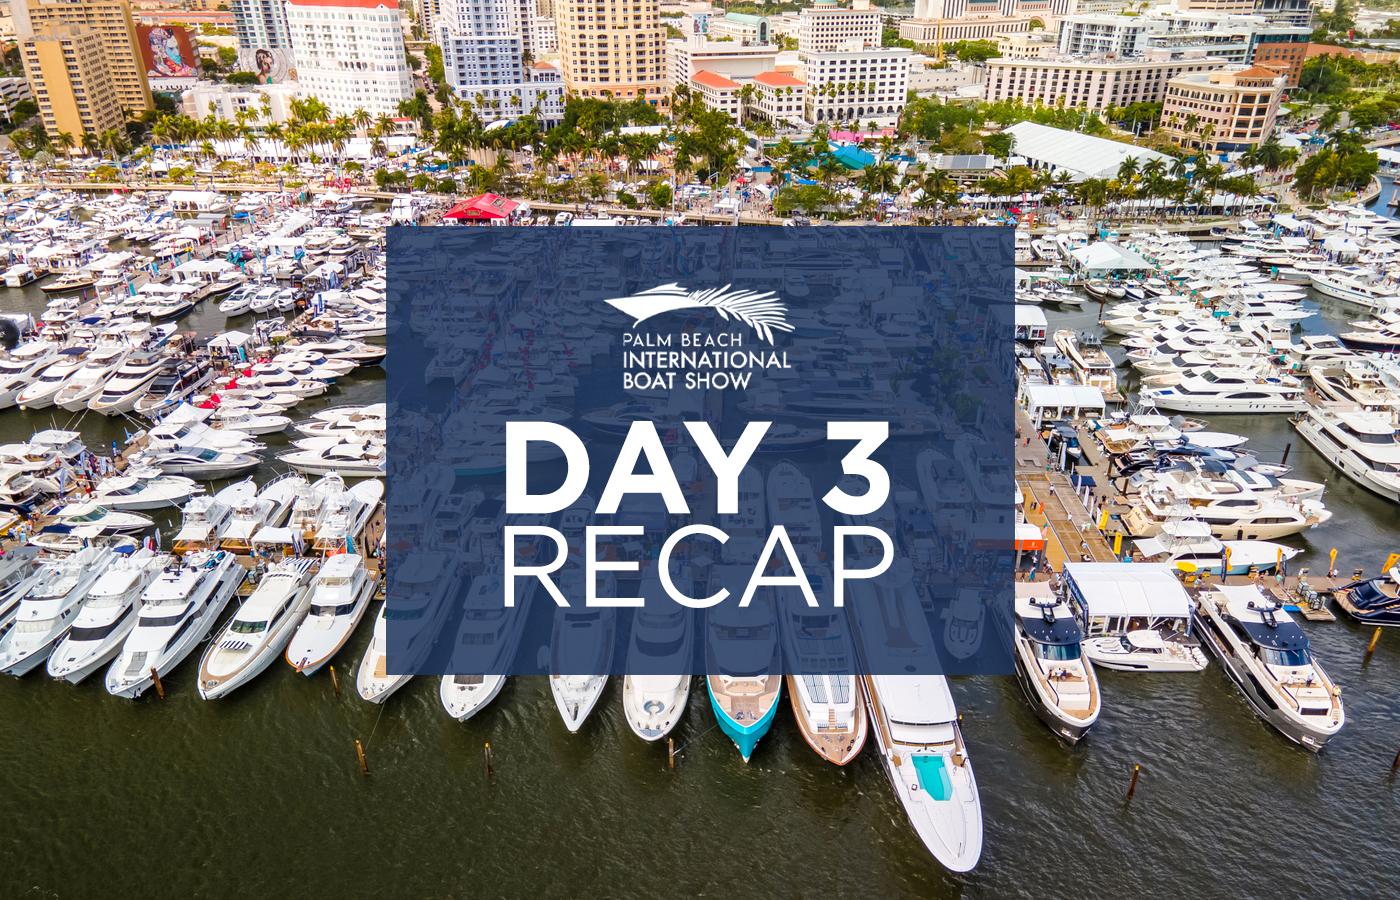 Palm Beach Boat Show 2021 Day 3 Recap